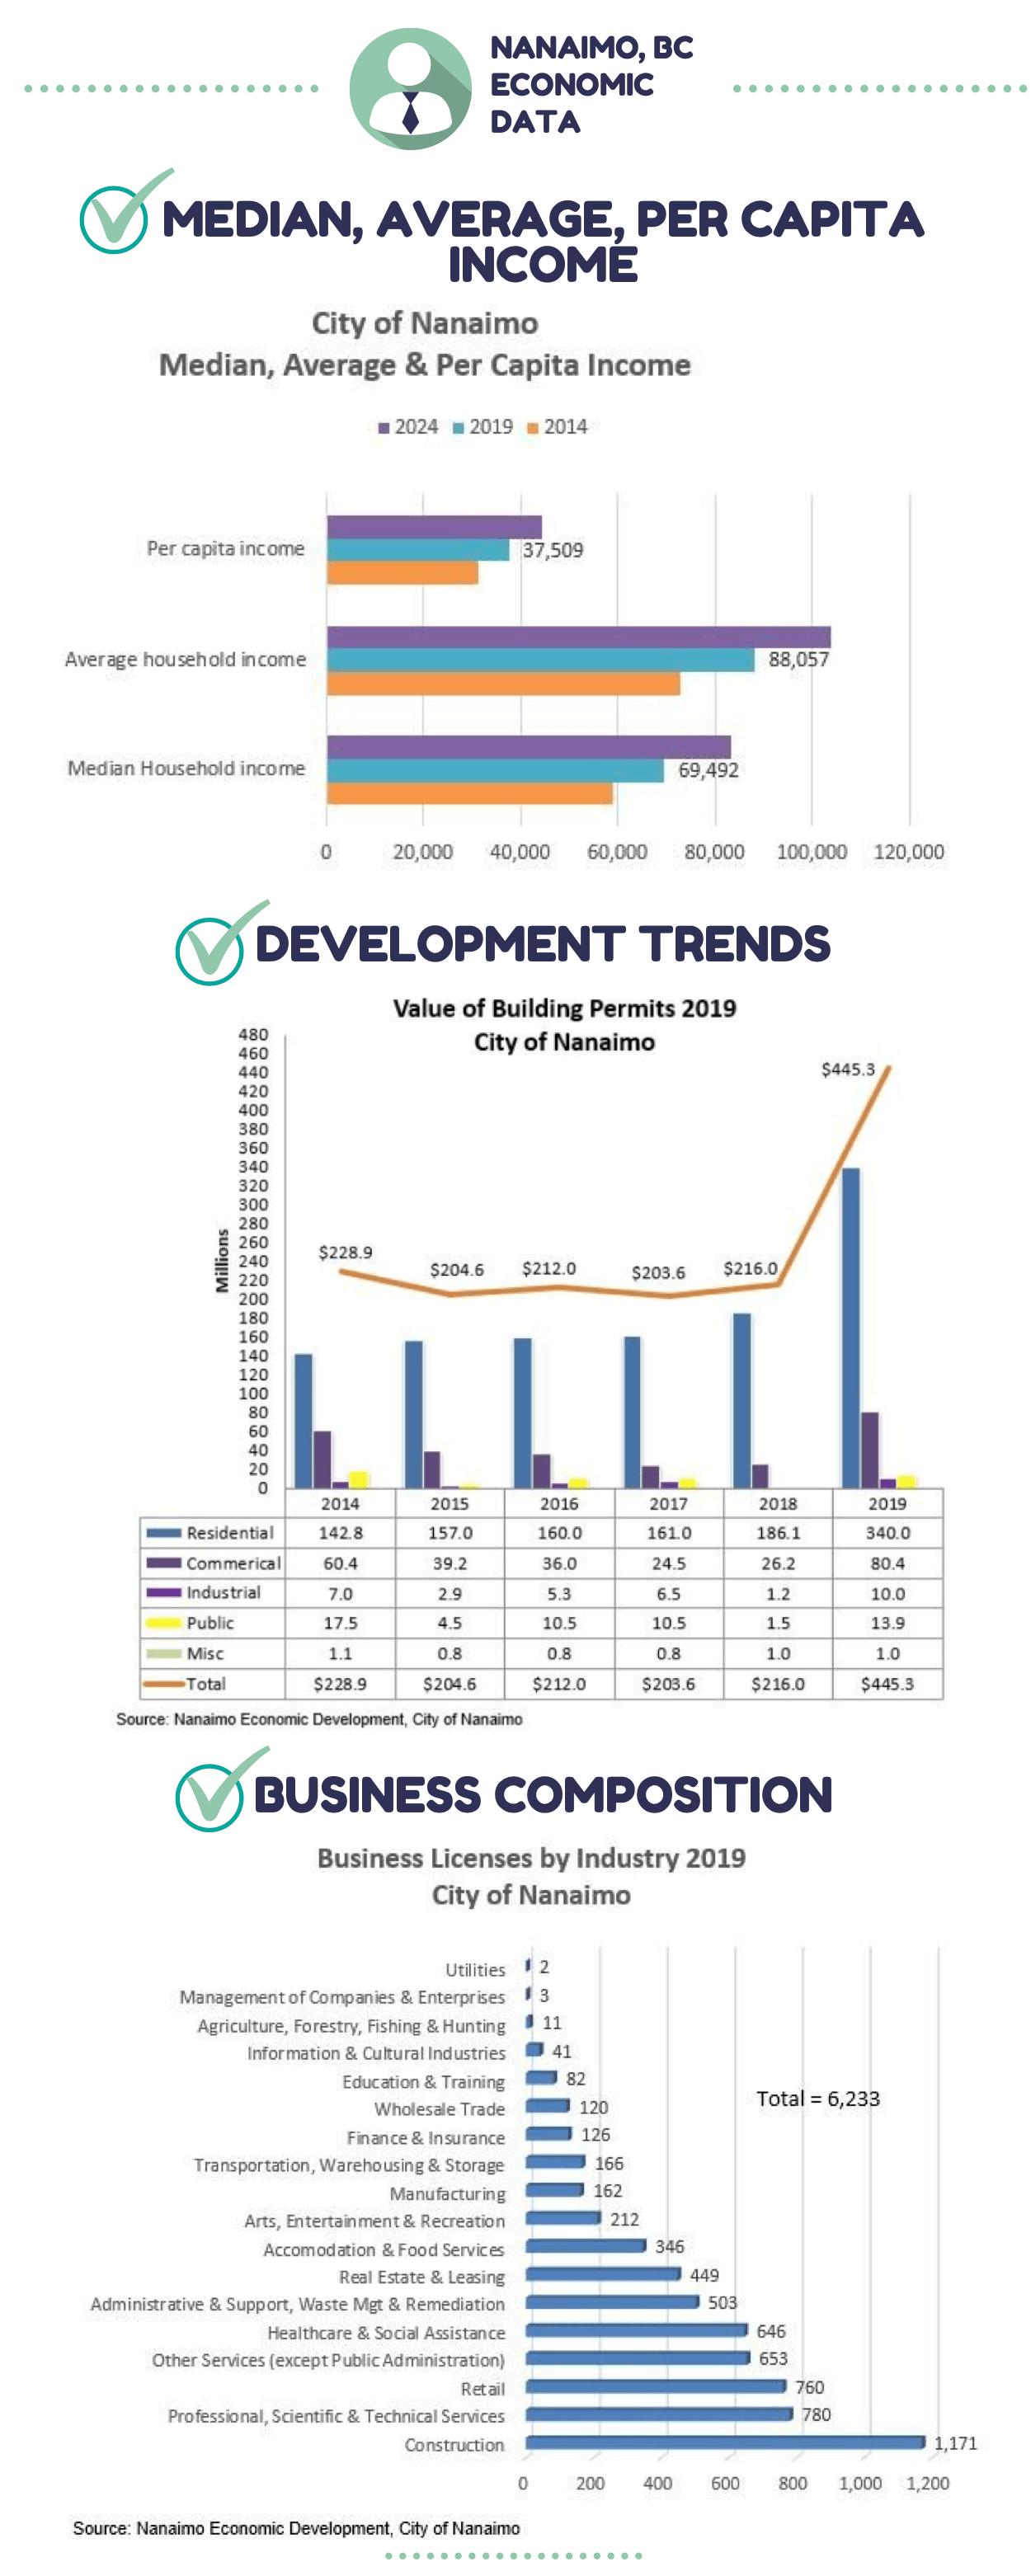 Nanaimo, BC Economic Data